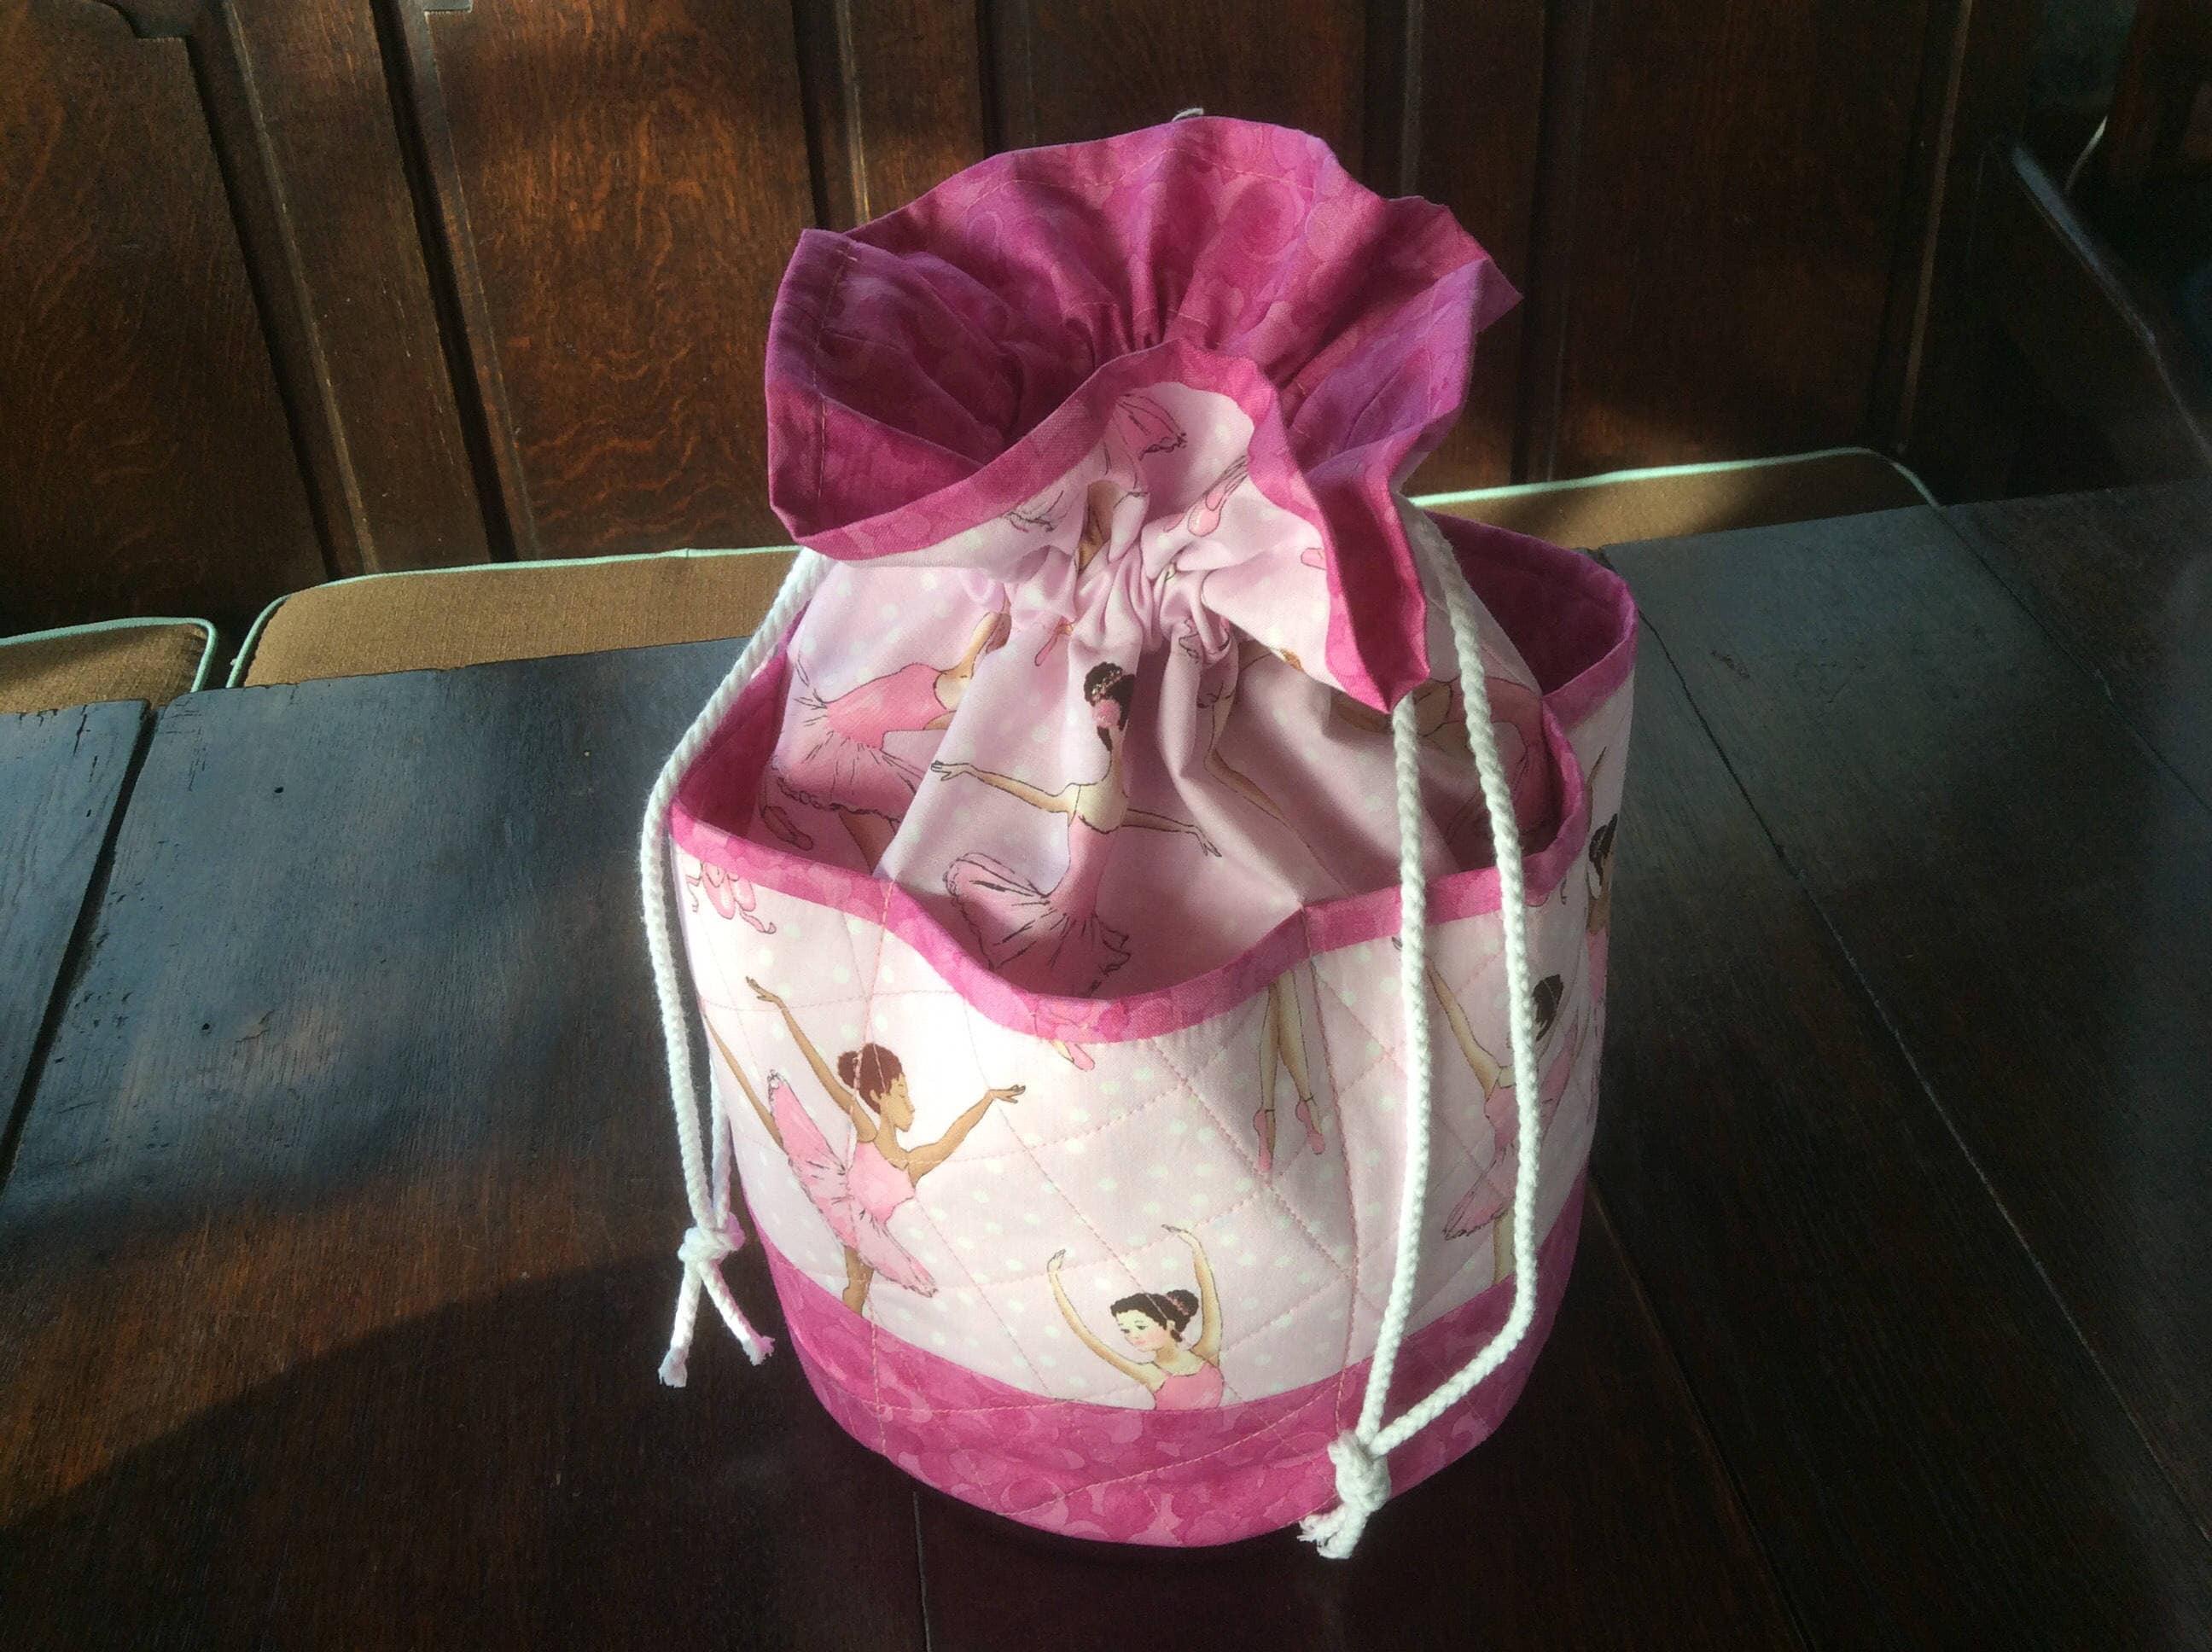 handmade handmade handmade ballerine cordon sac sac rose. multi - purpose sac. dance sac. chaussure sac patchwork sac. cordon tote. ballerine tote.gift. d17b2f